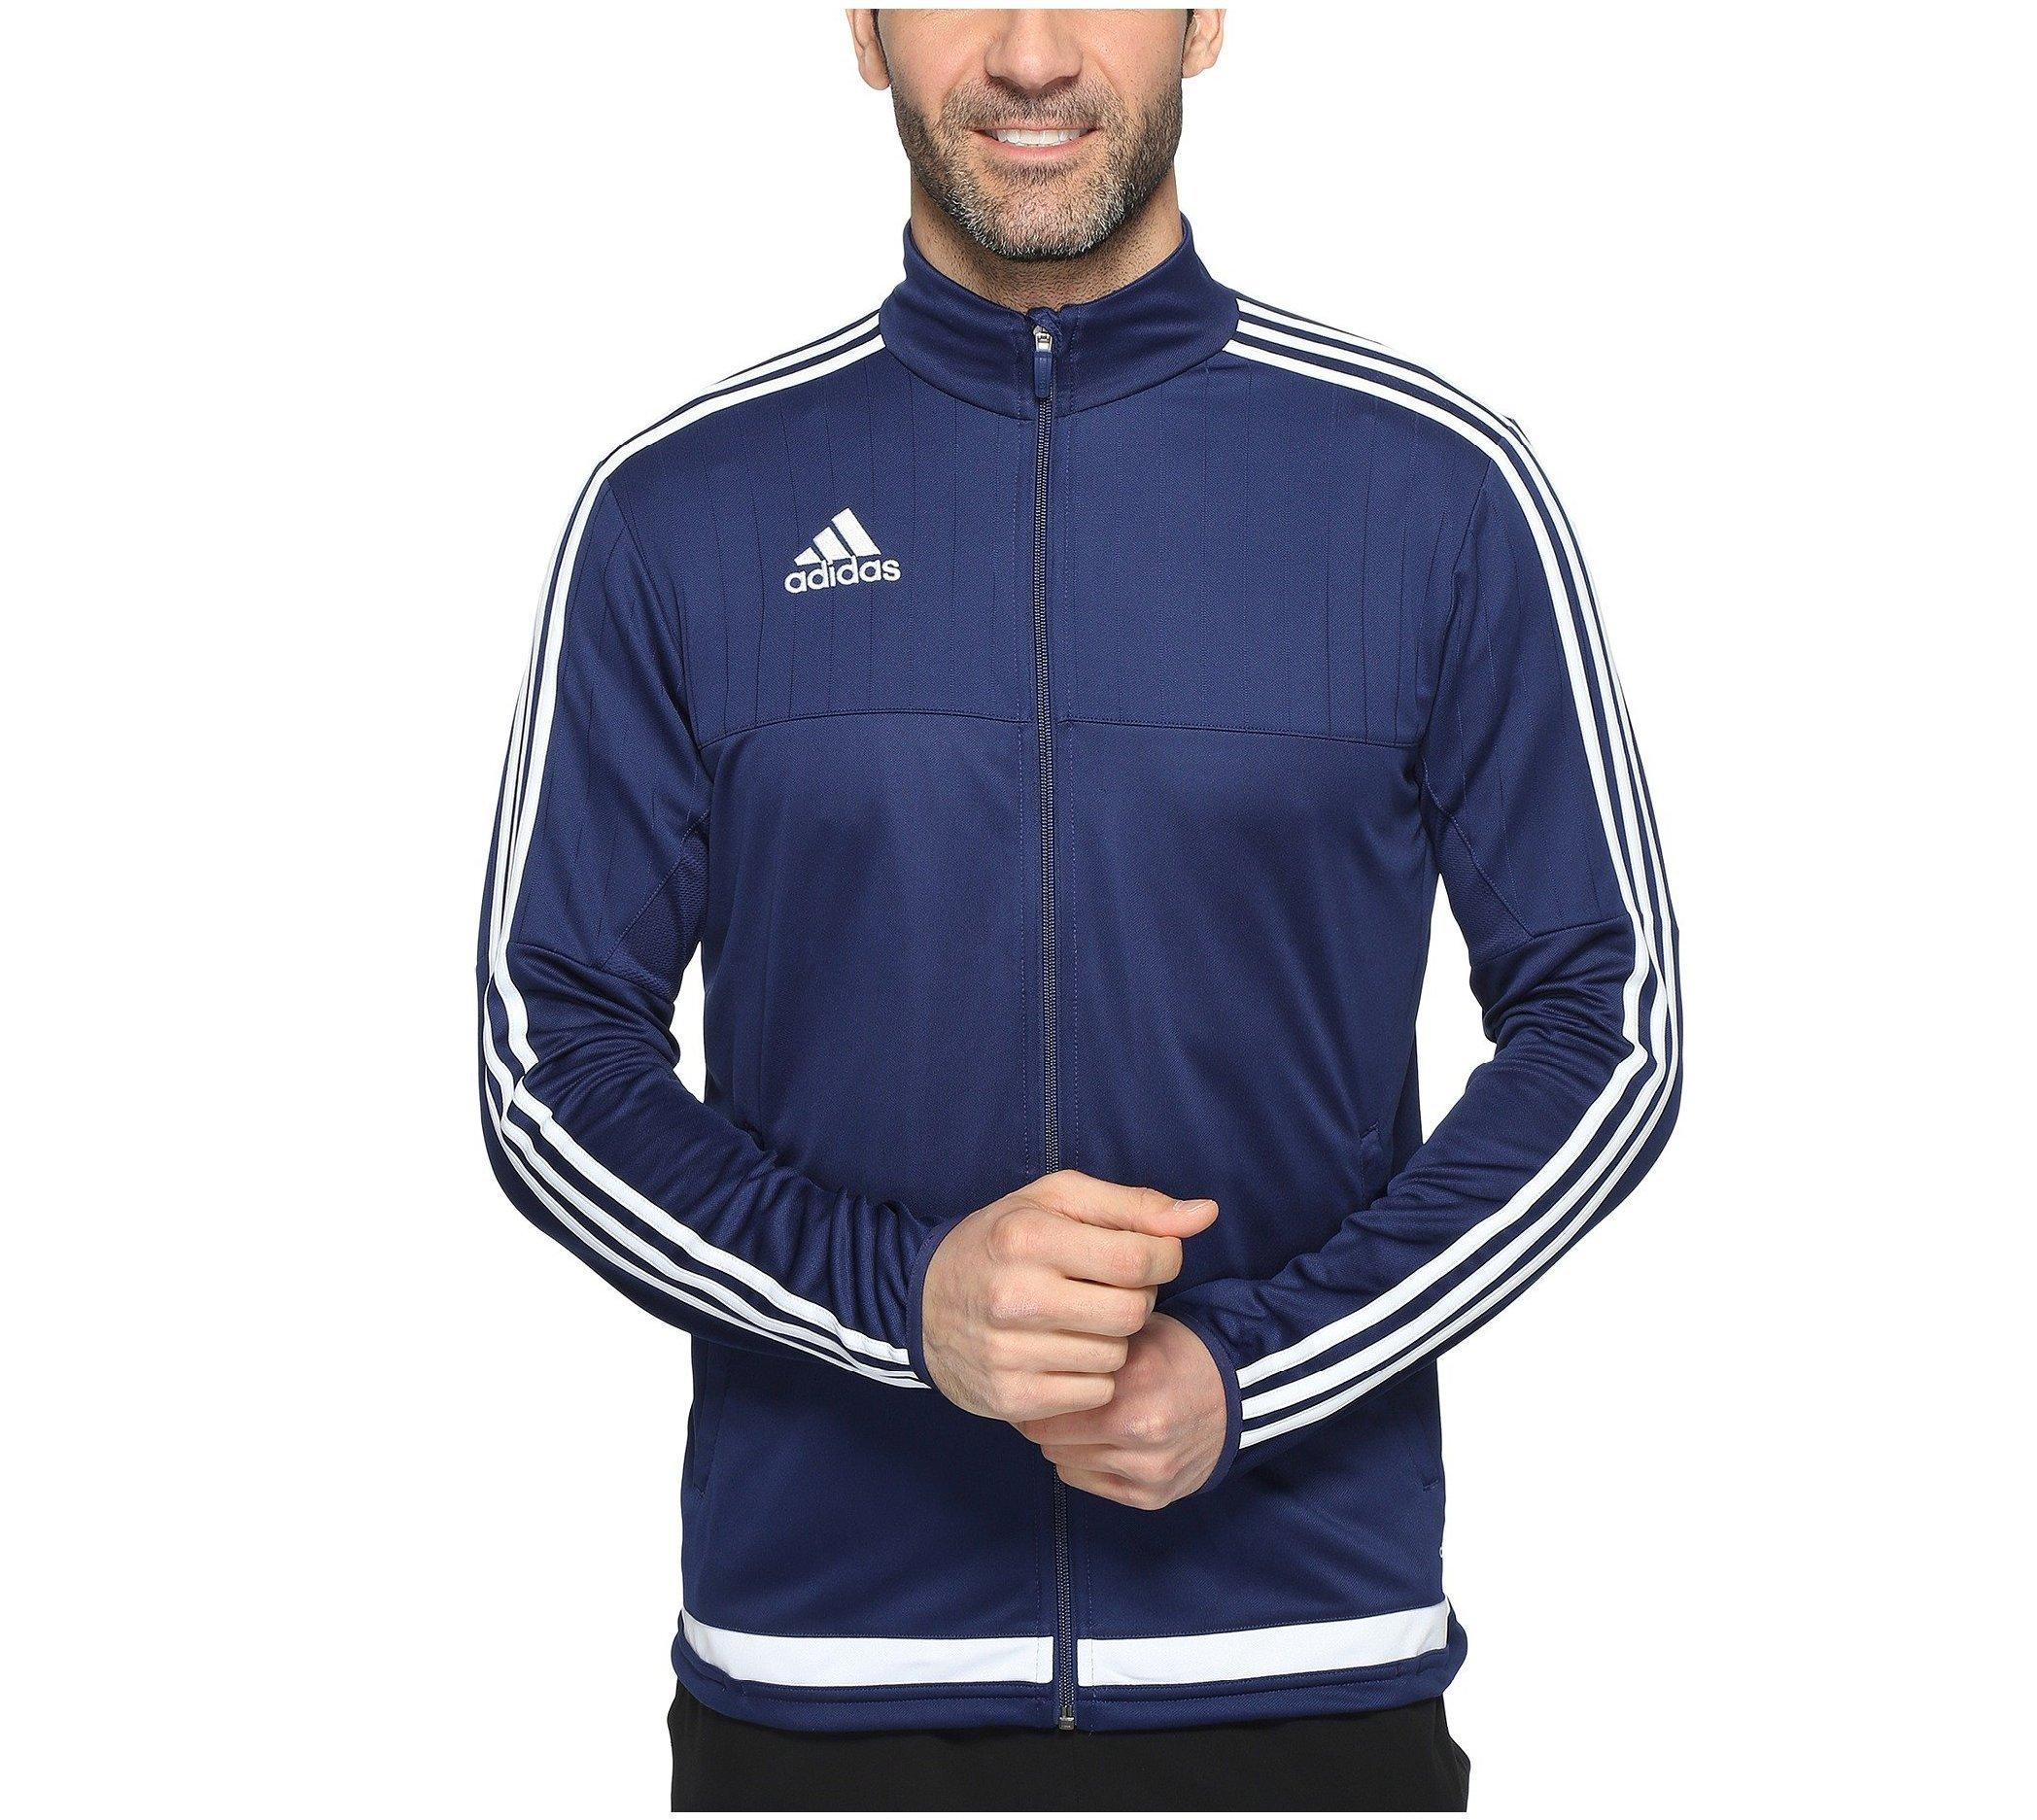 adidas Men's Soccer Tiro 15 Training Jacket, Dark Blue/White/Dark Blue, Large